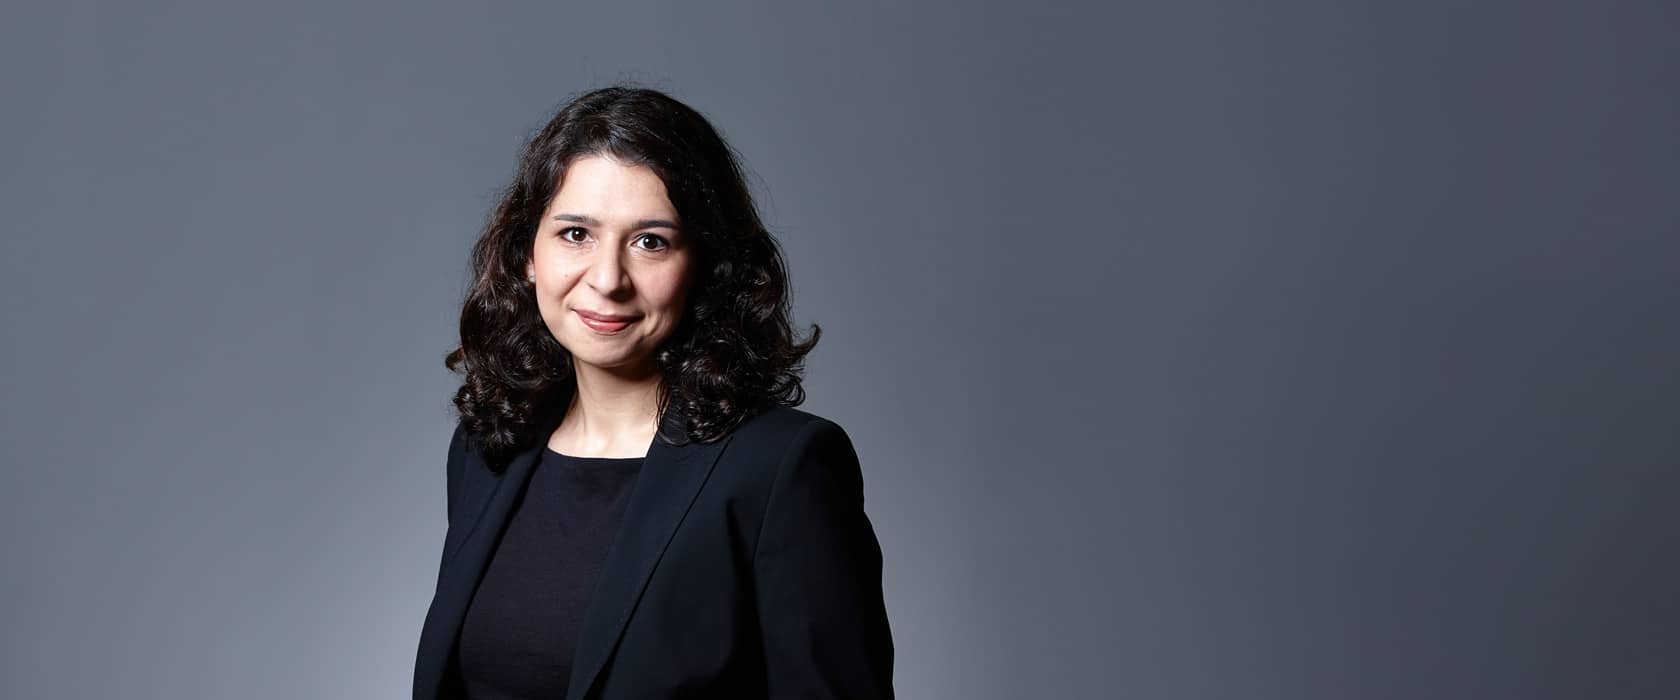 Bita Foroghi | Rechtsanwältin der Kanzlei Kötz Fusbahn